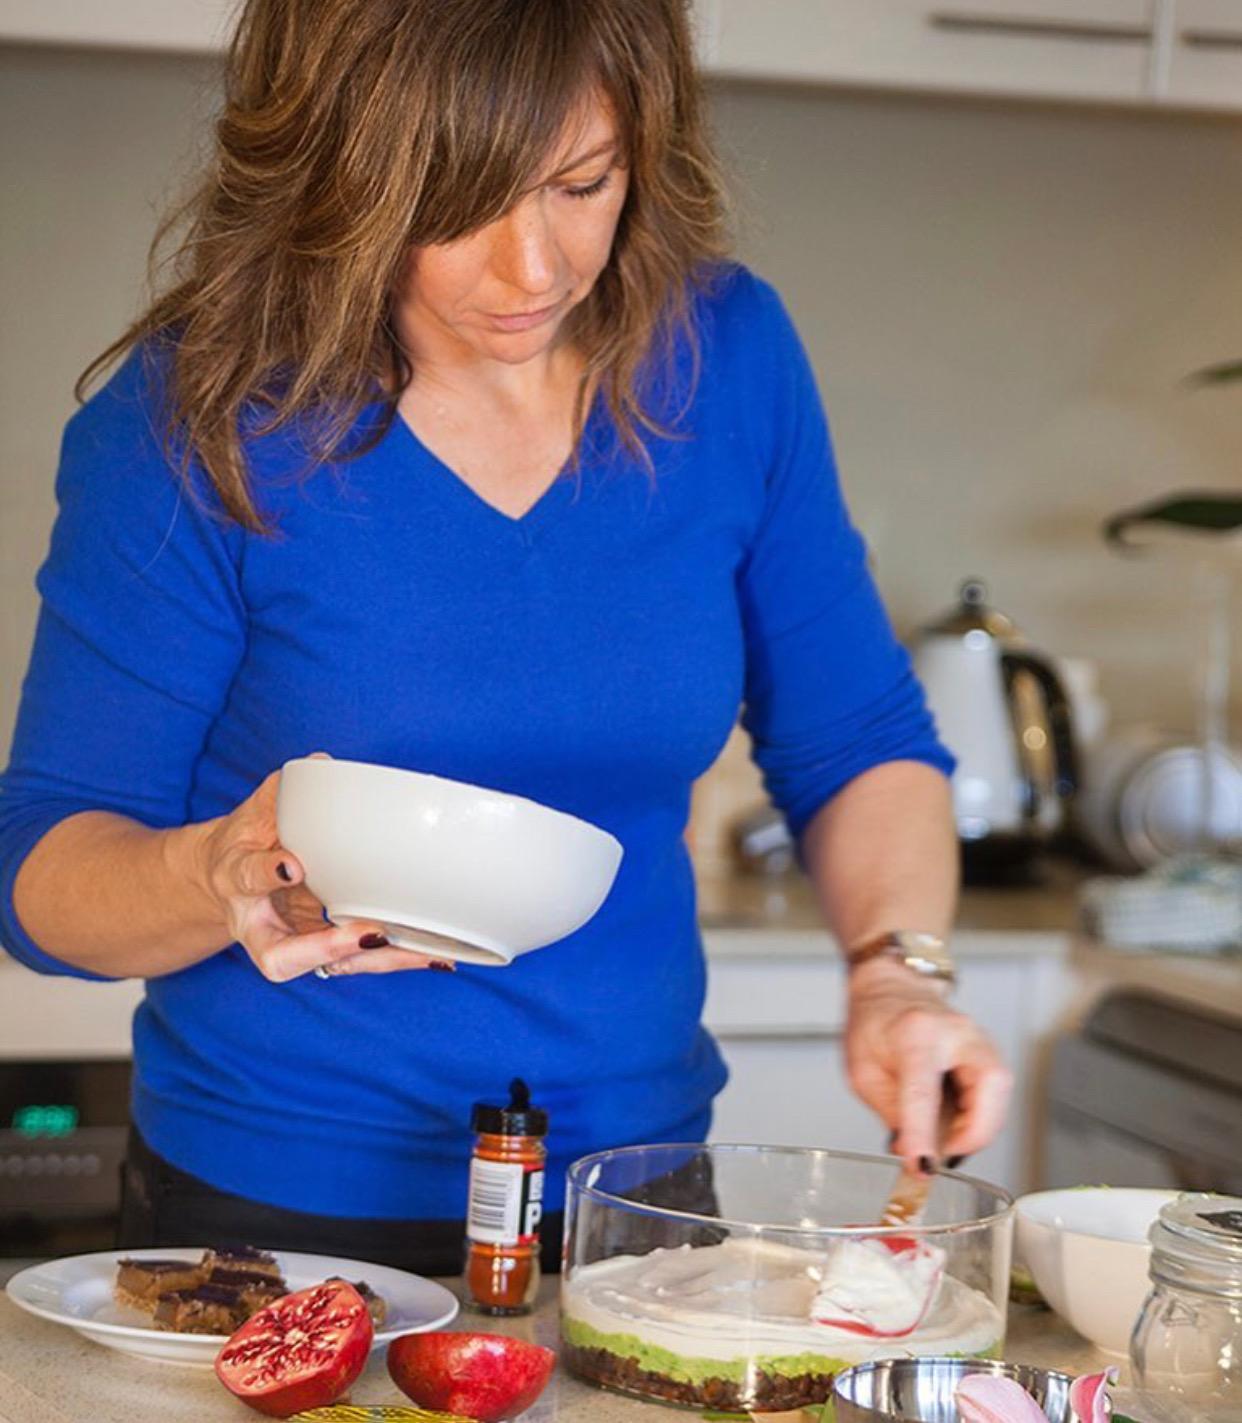 Freya's Nourishment Kristie Murphy interview | The Flourishing Pantry